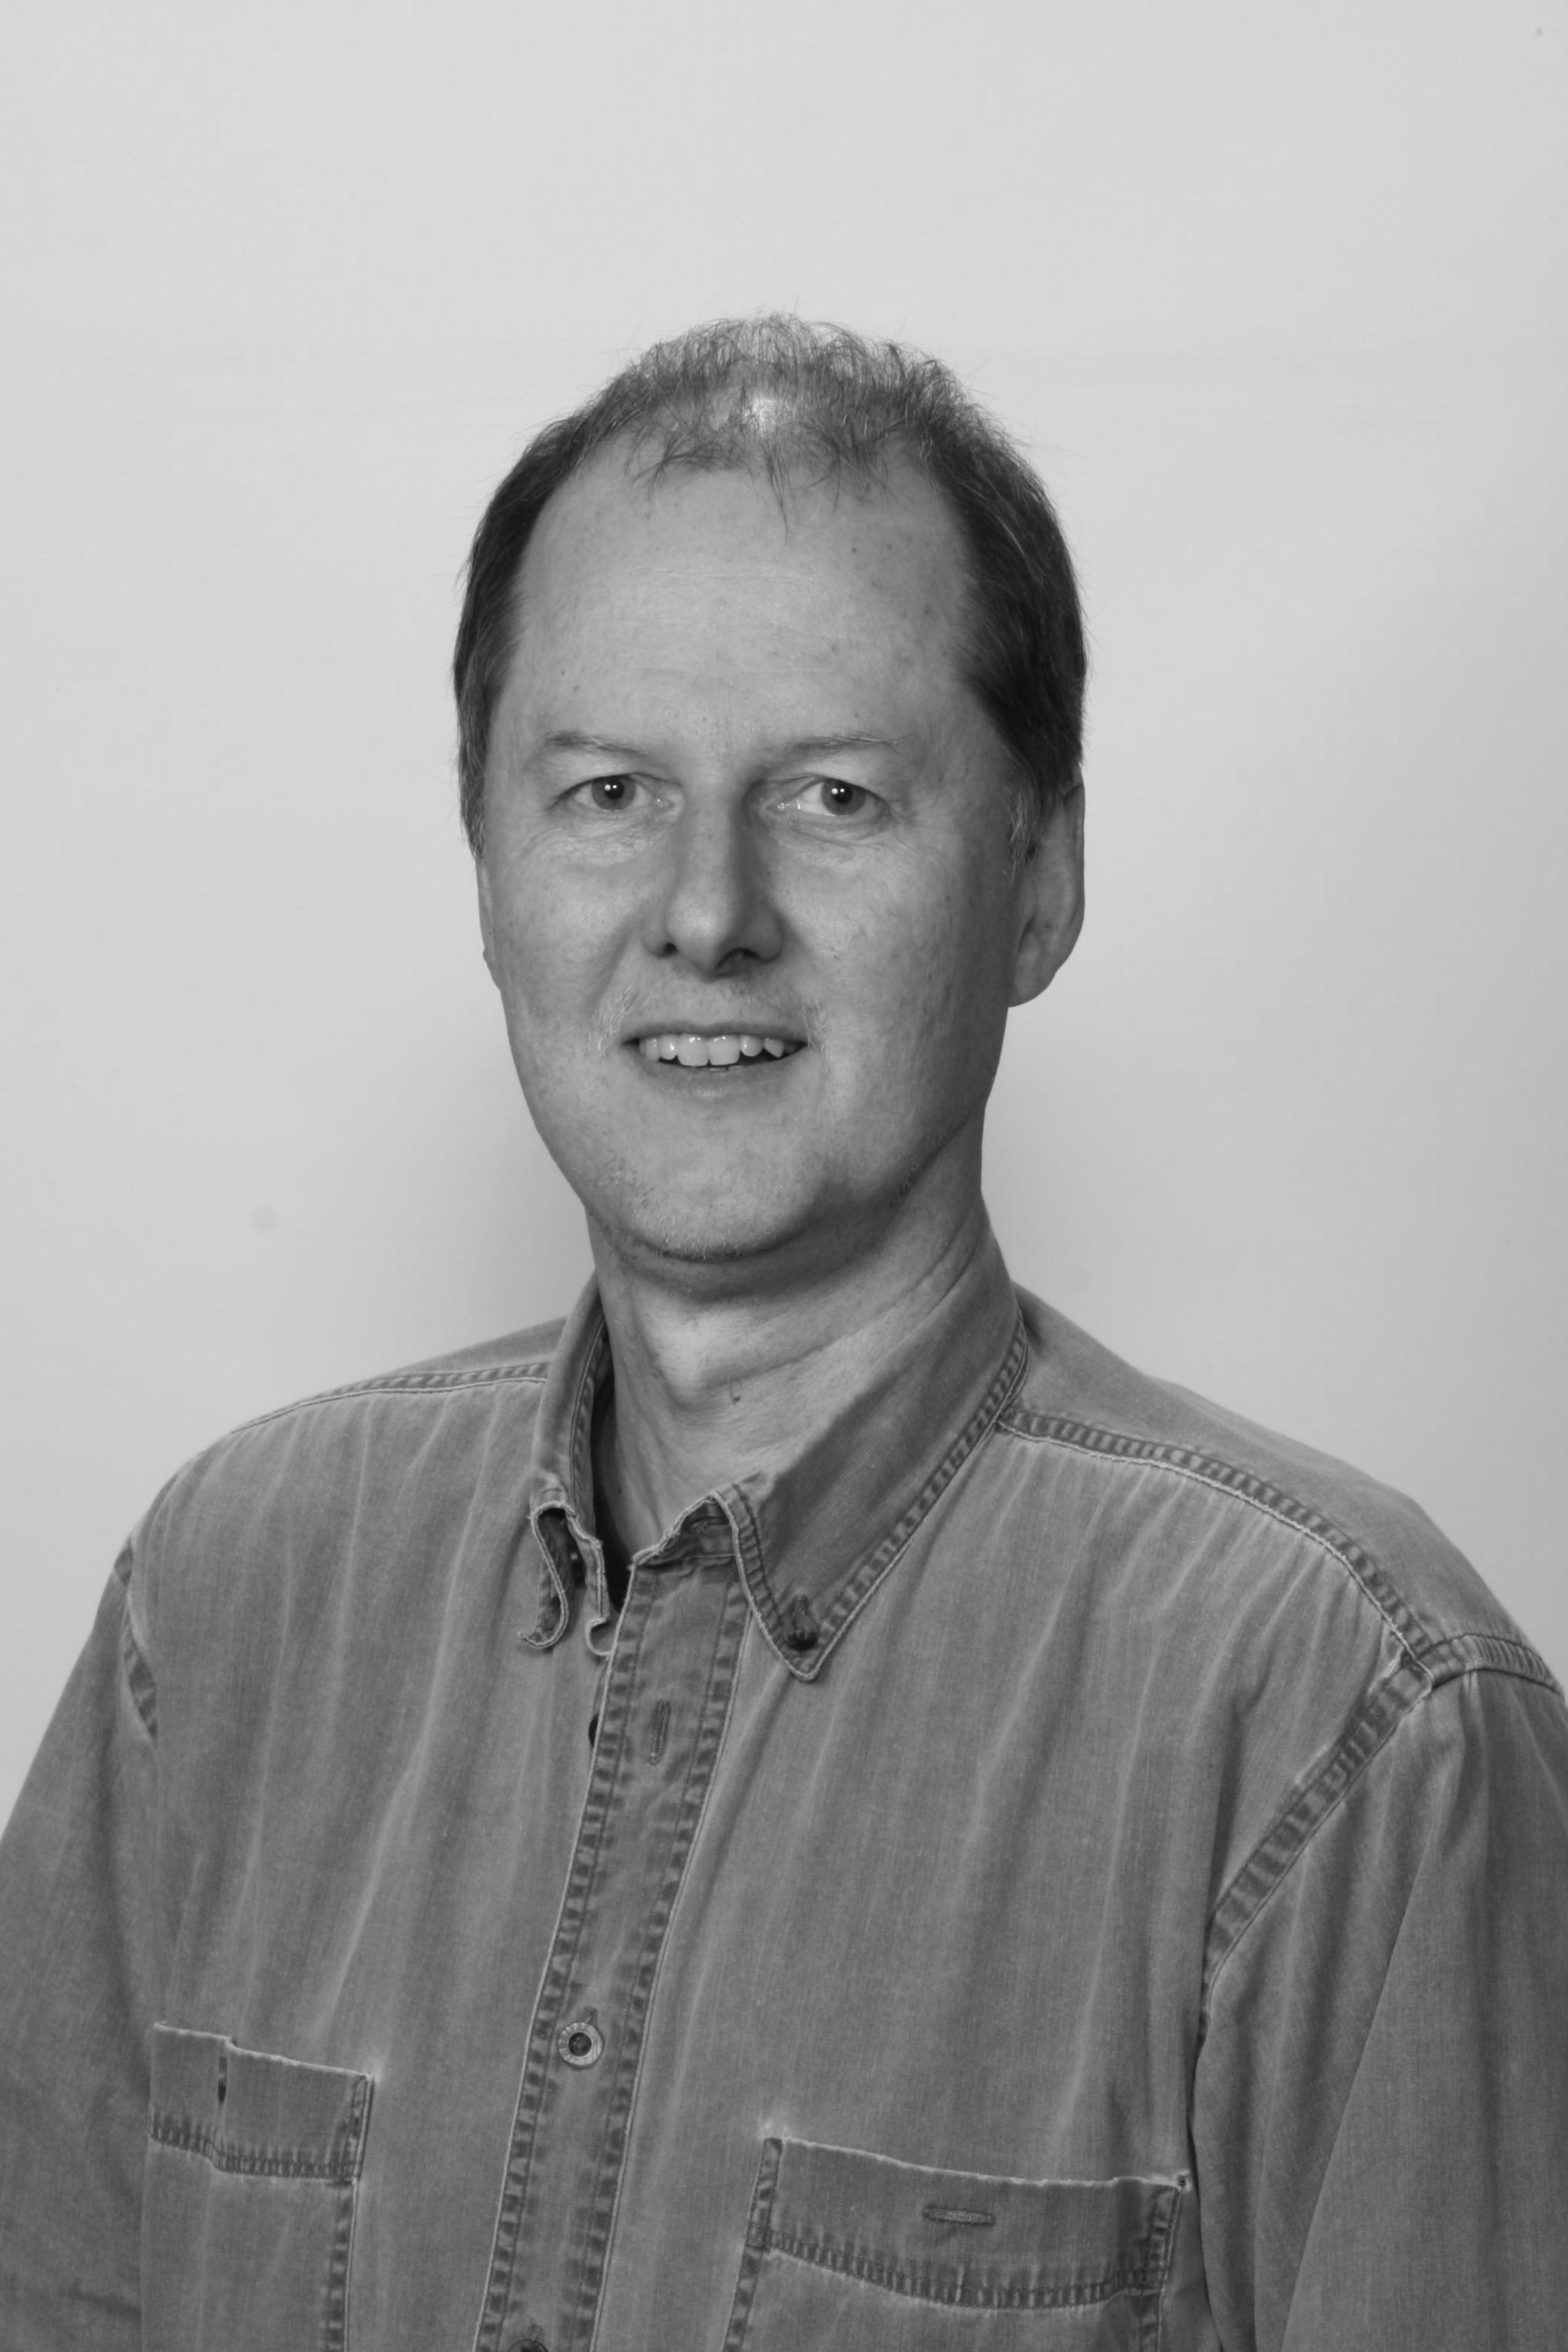 Douglas Lloyd